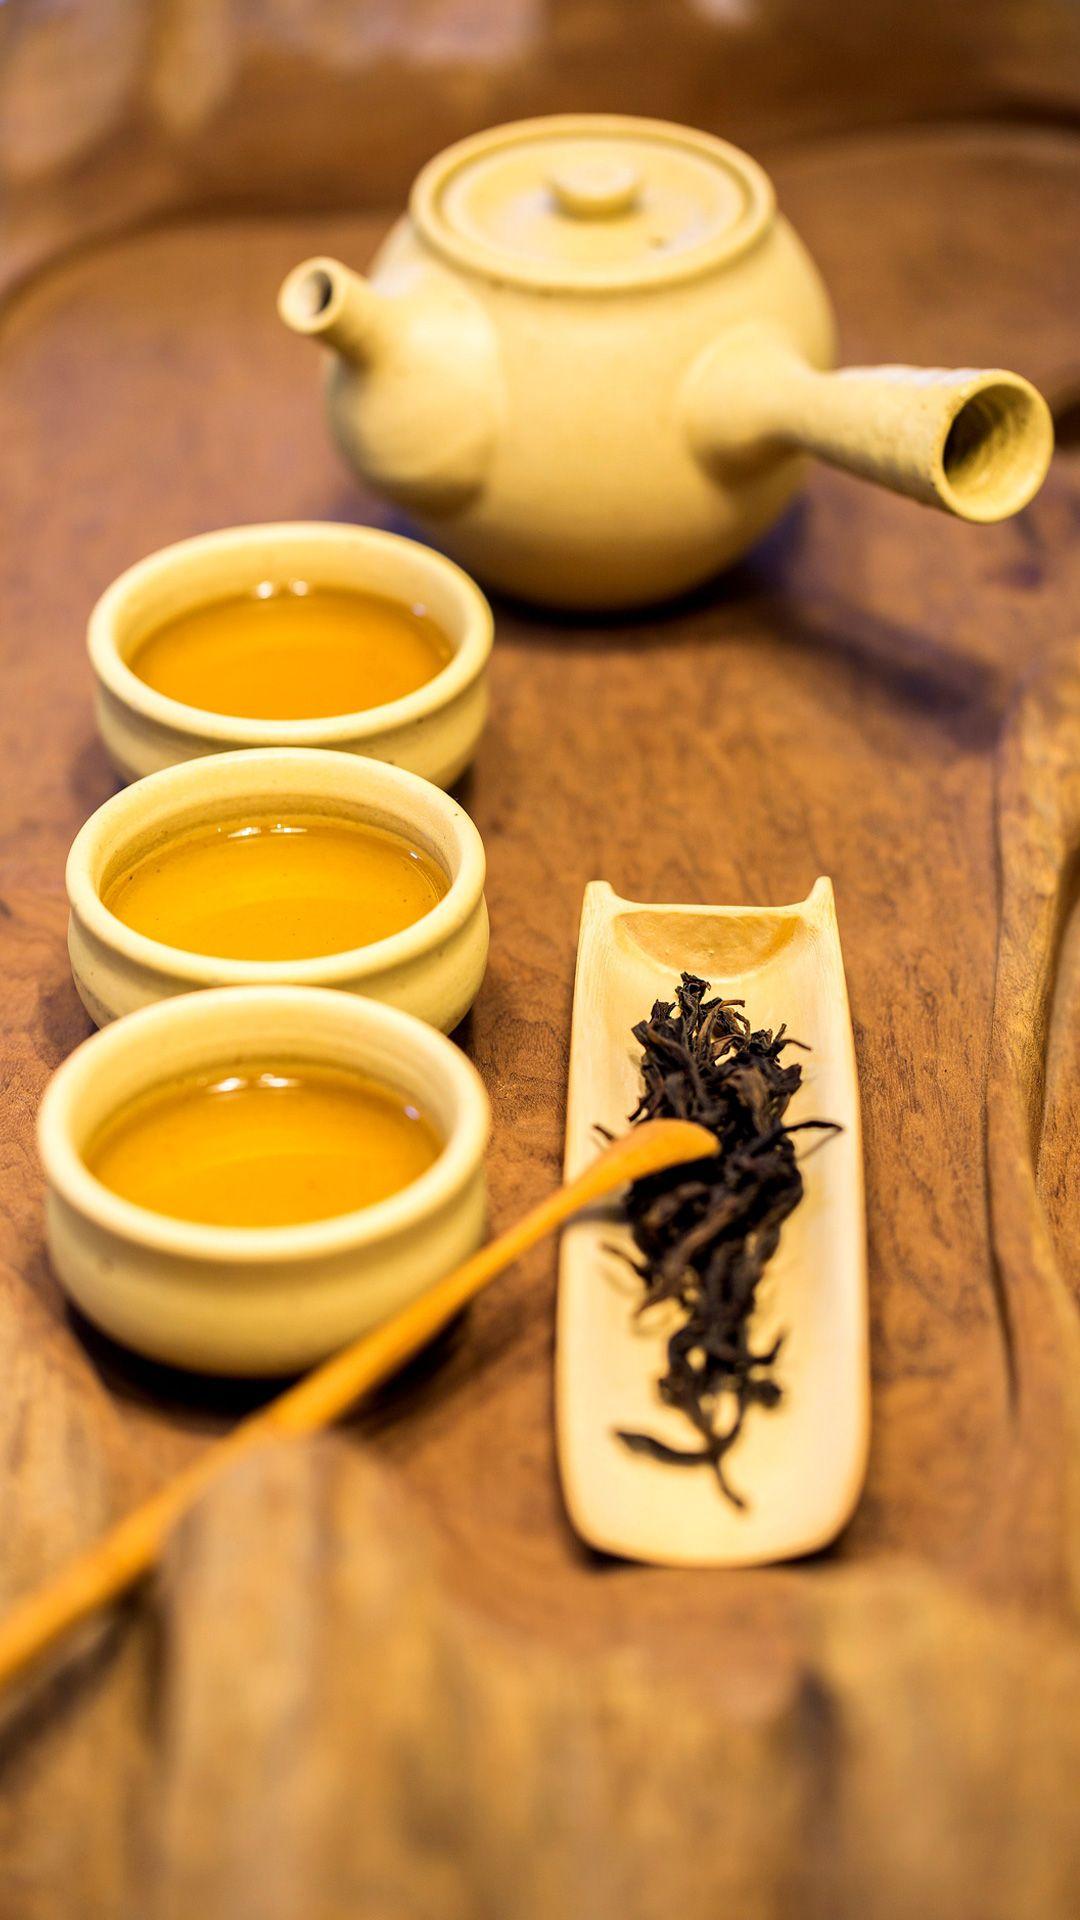 Chinese tea yummy food chinese tea food